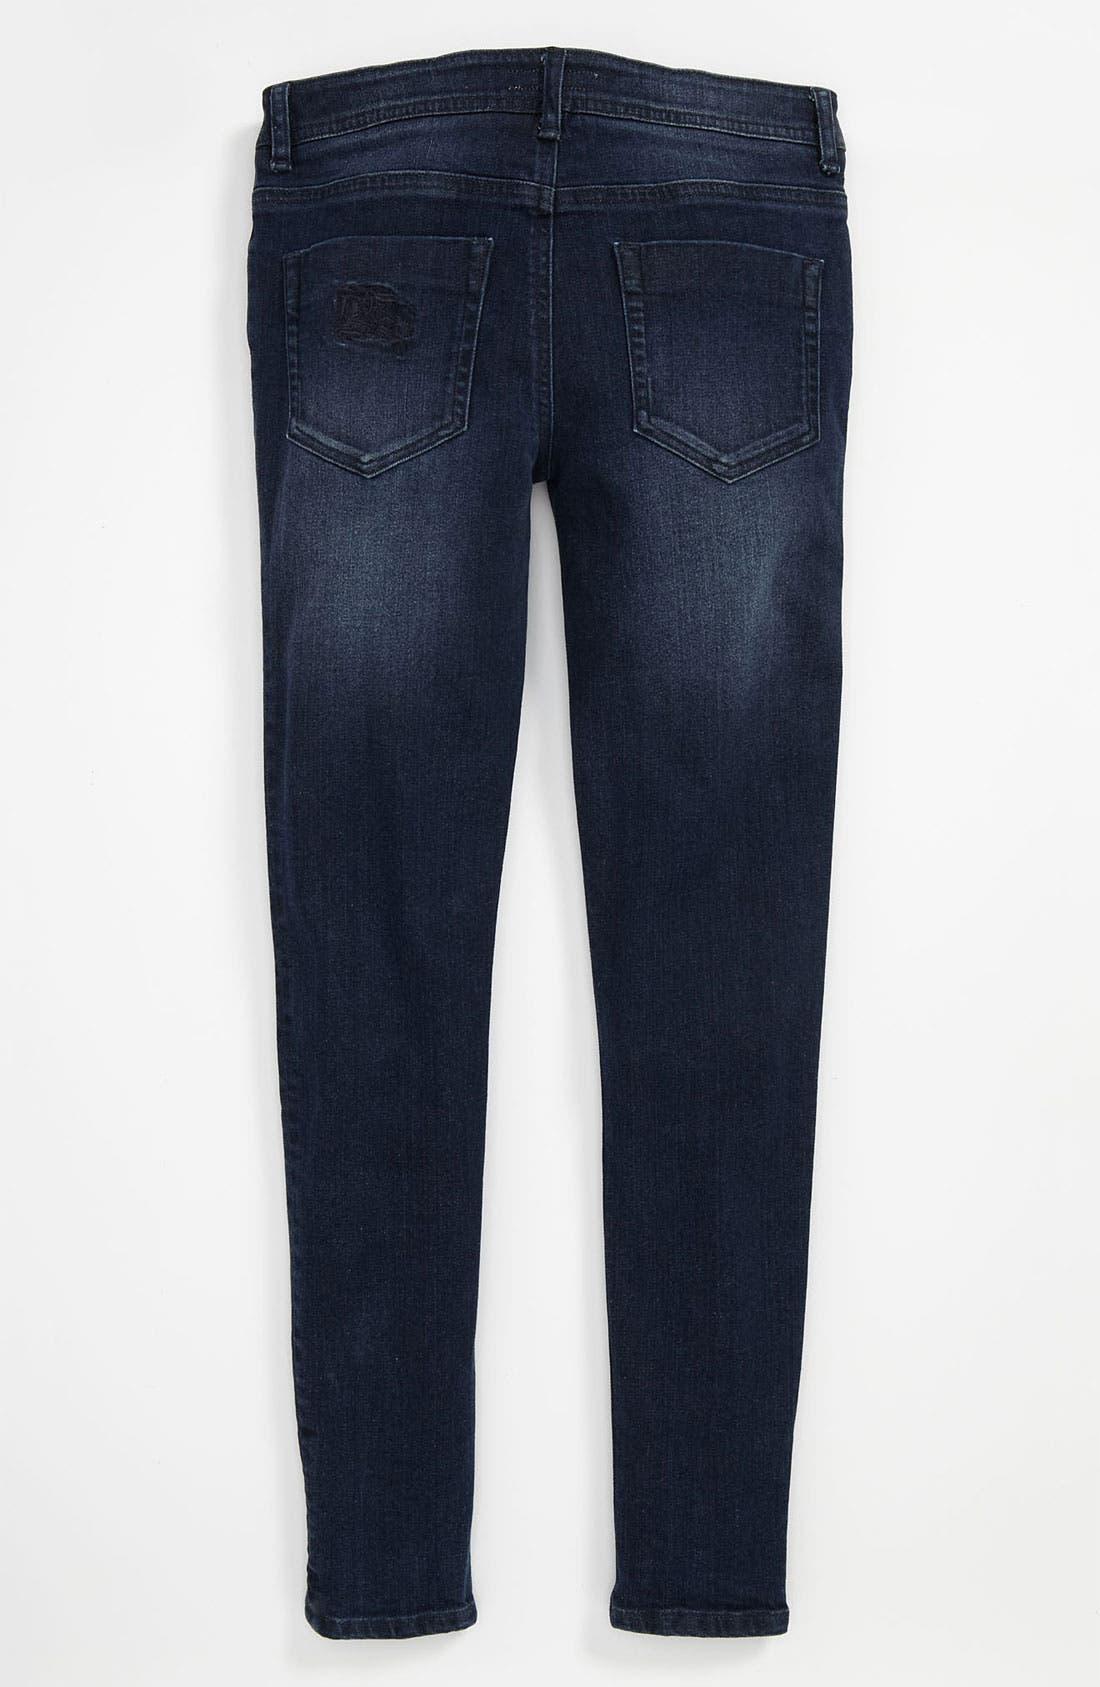 Alternate Image 1 Selected - Burberry 'Mini Langley' Skinny Jeans (Little Girls & Big Girls)